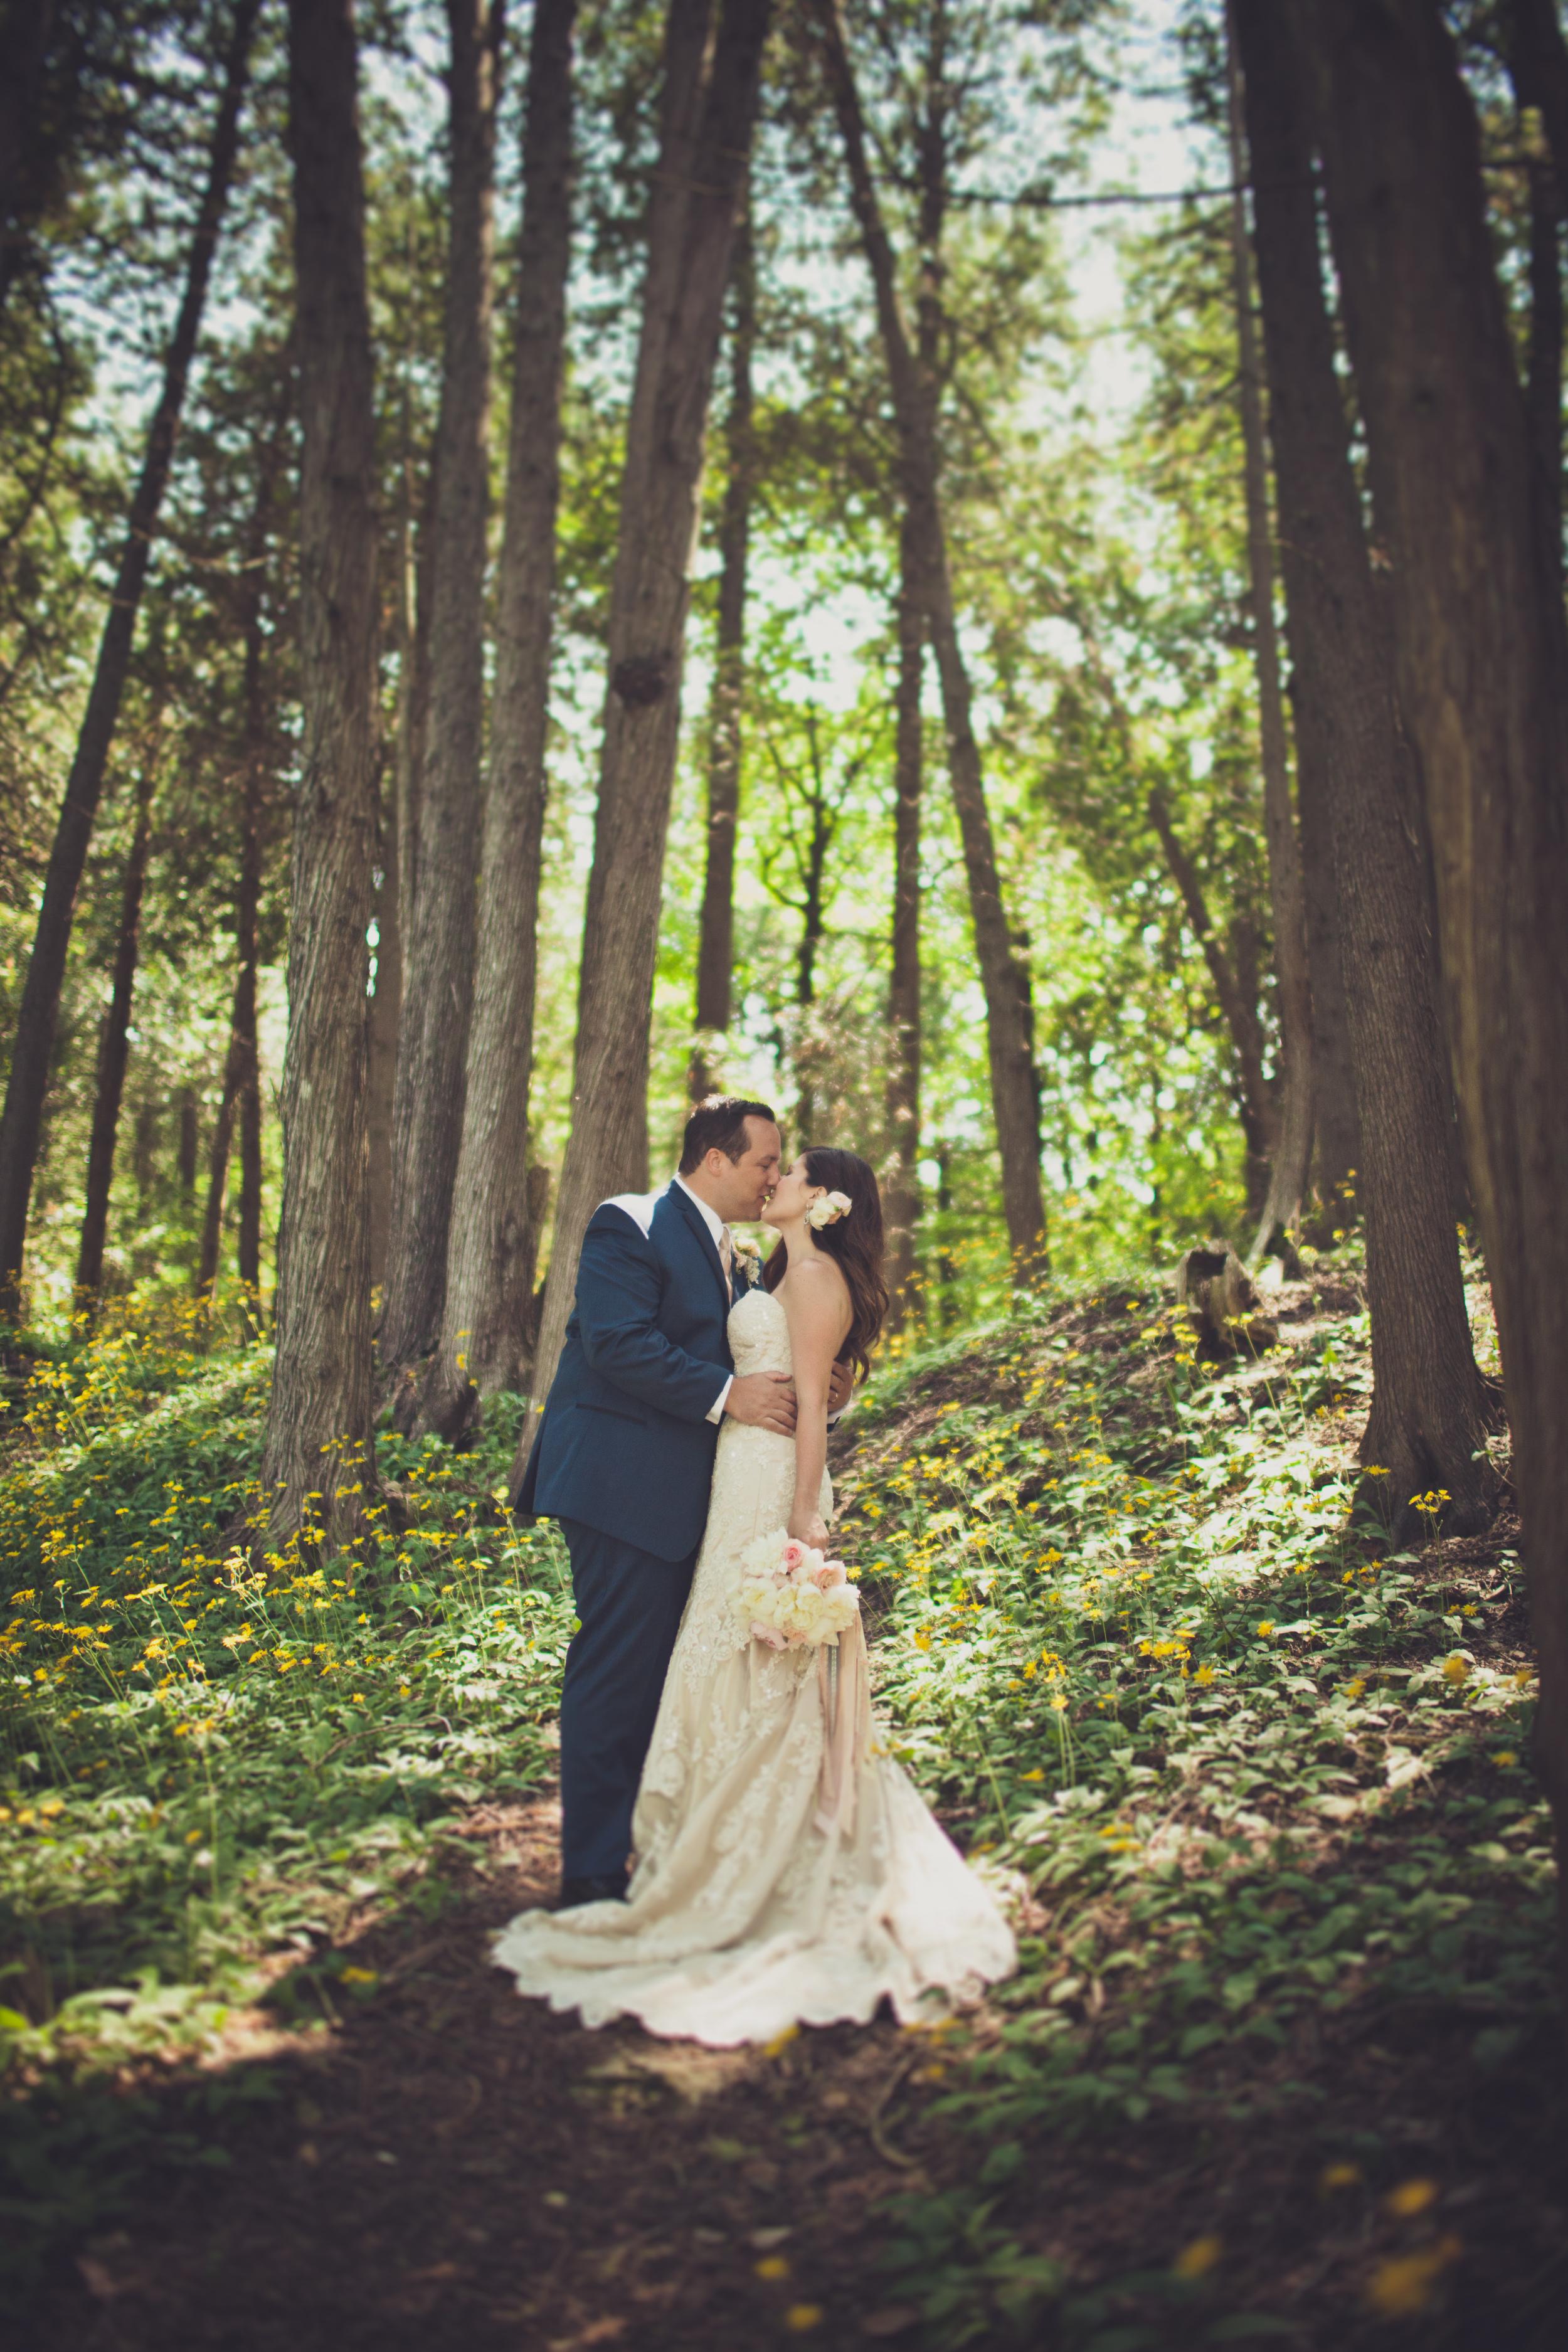 p_k_wedding-475.jpg